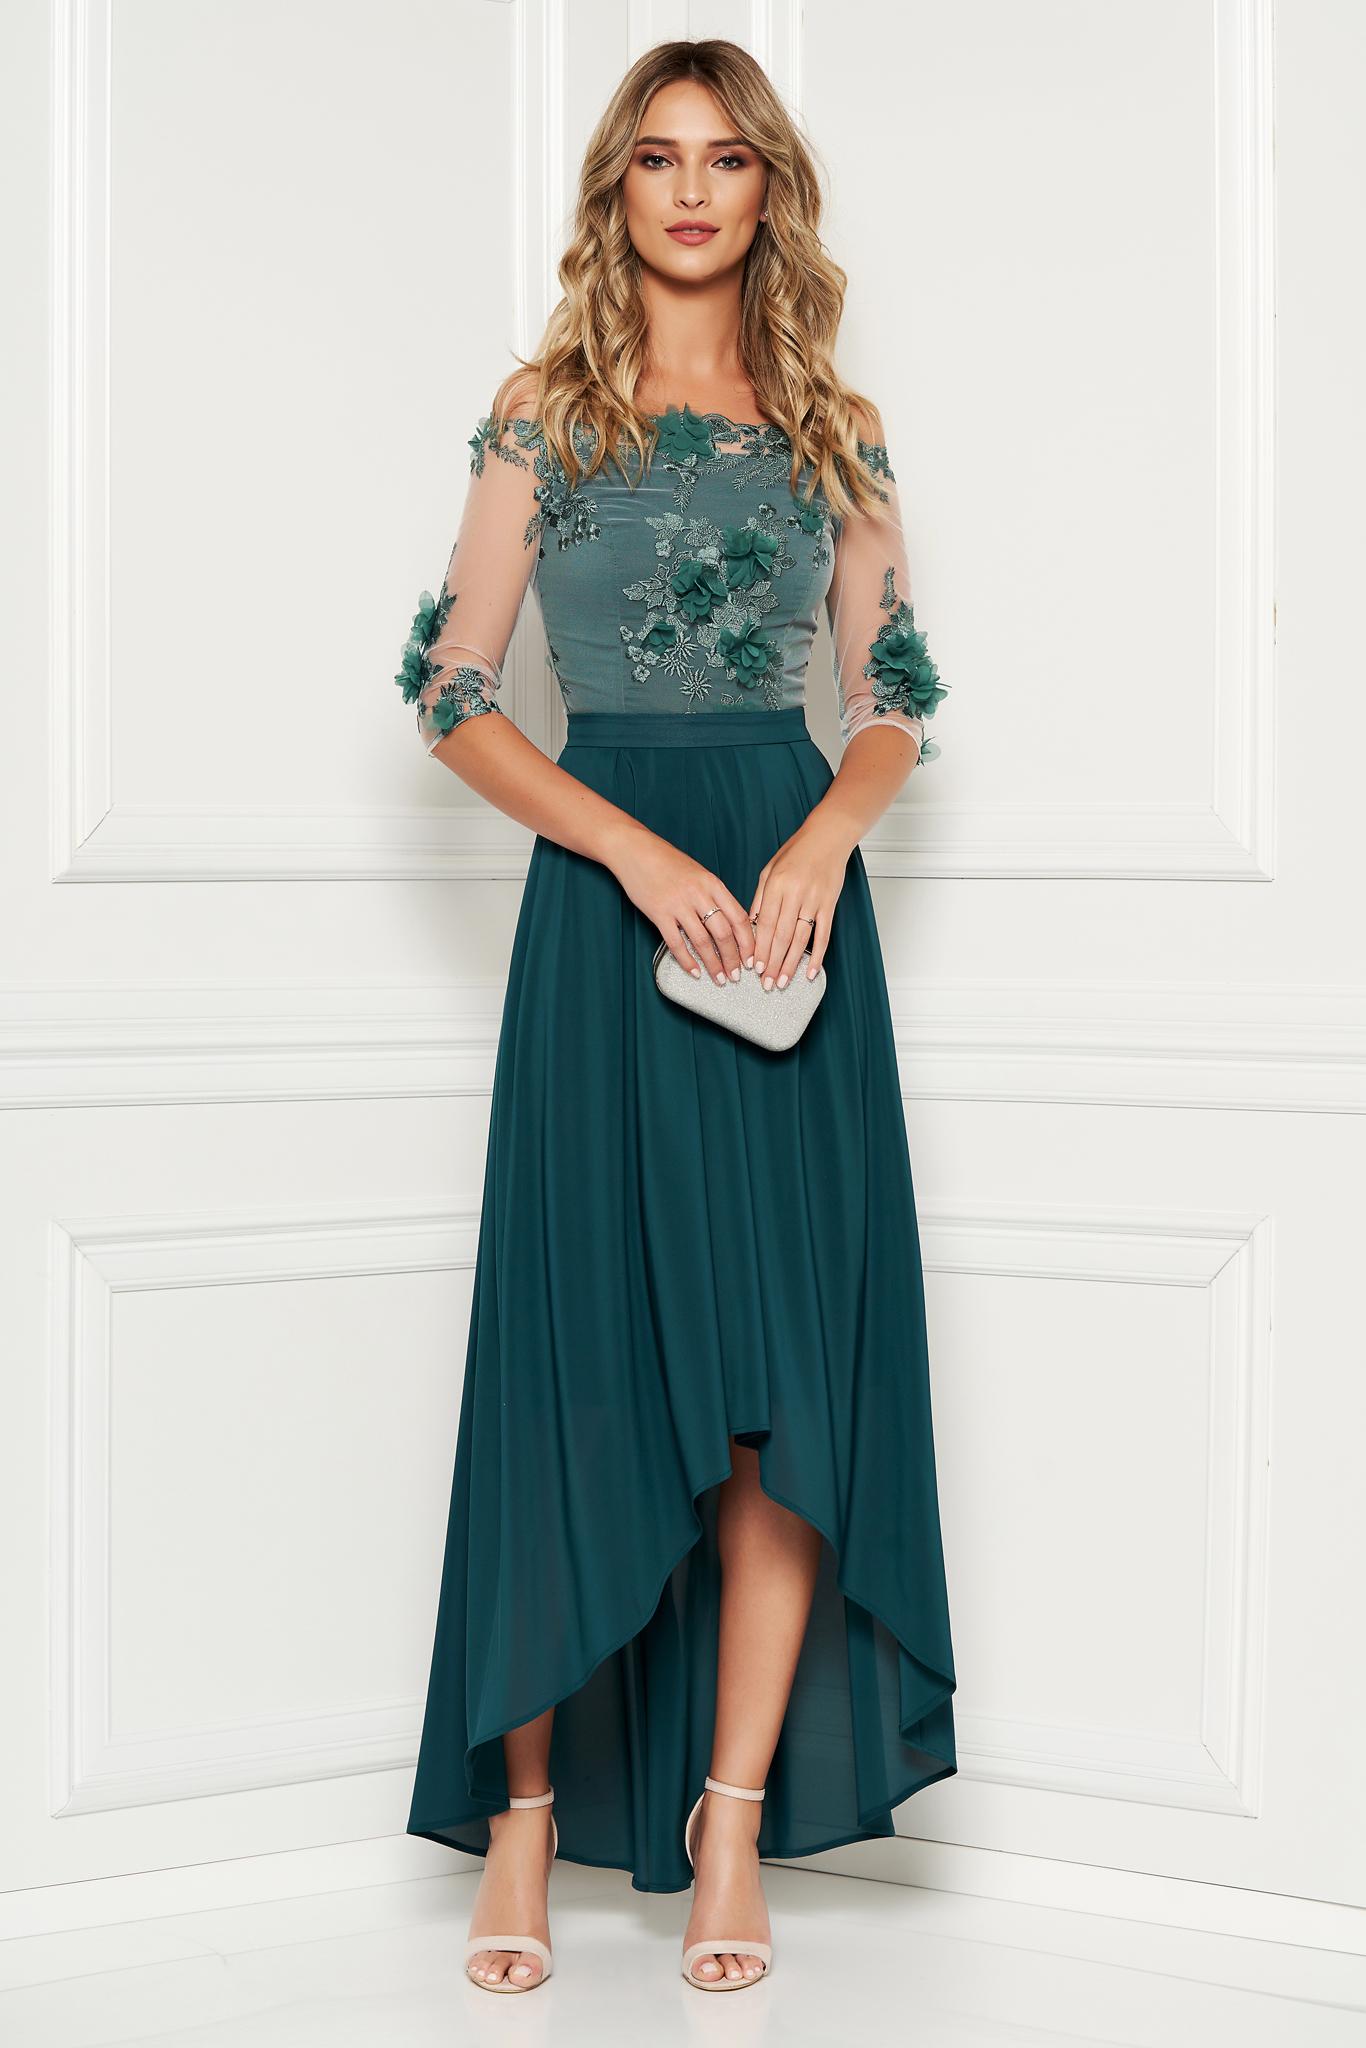 Rochie StarShinerS verde de ocazie asimetrica din muszlin si dantela in clos accesorizata cu cordon